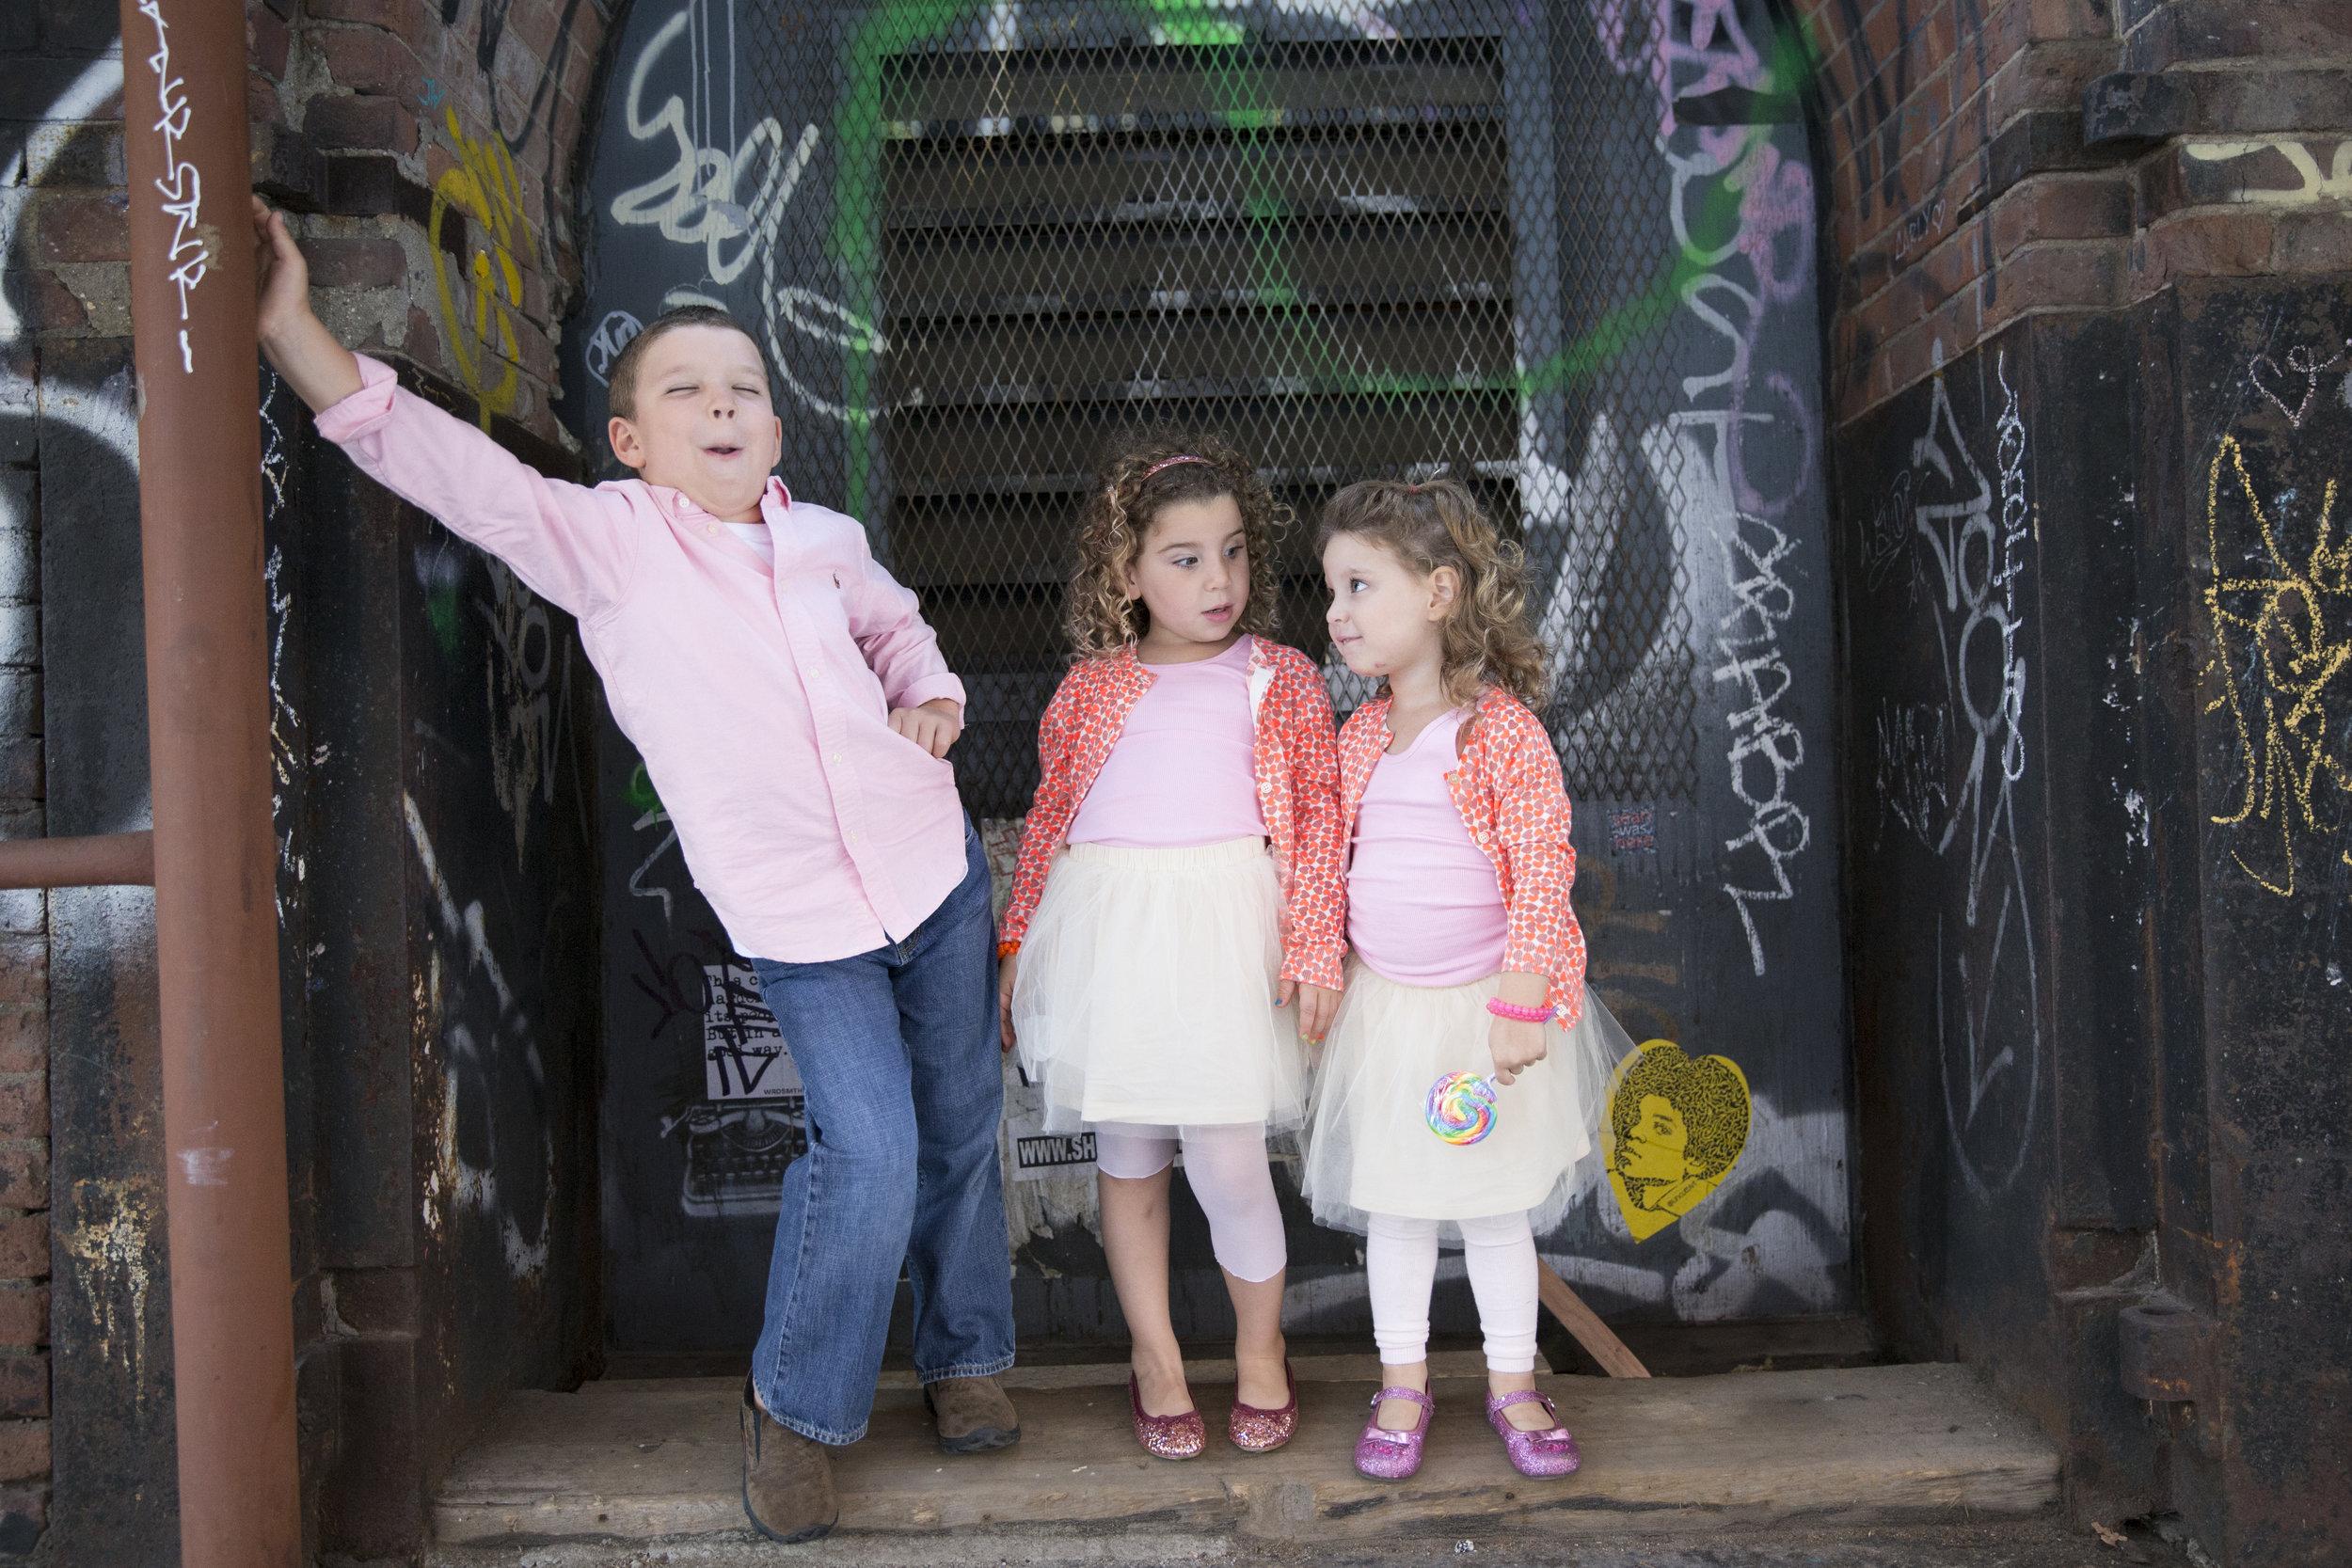 children's Photo shoot in Brooklyn NY